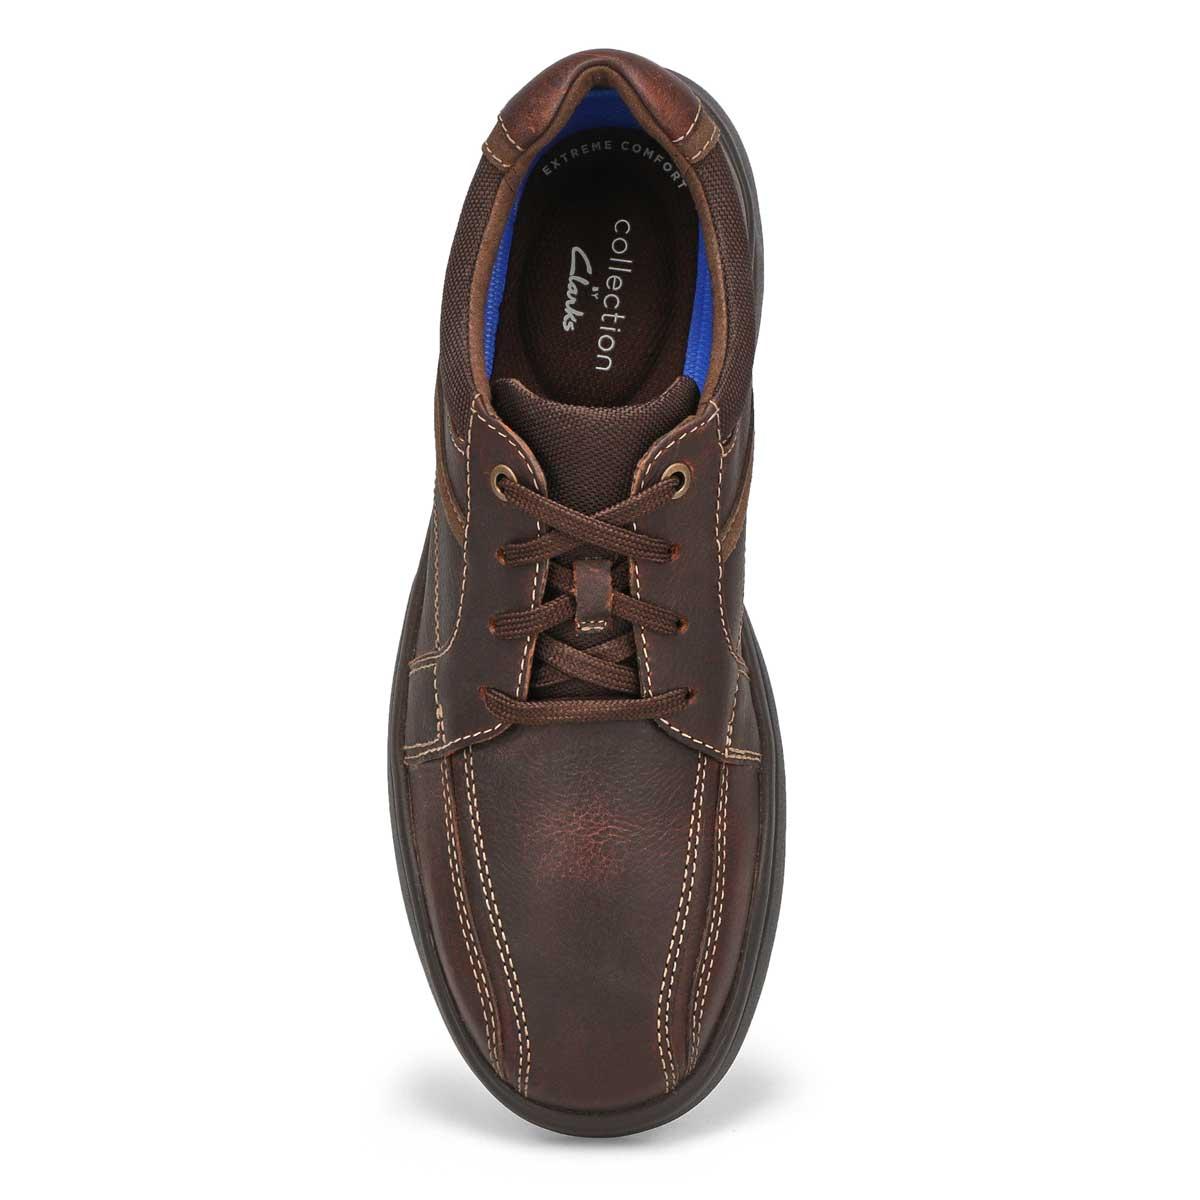 Mns Bradley Walk brown lace up loafer